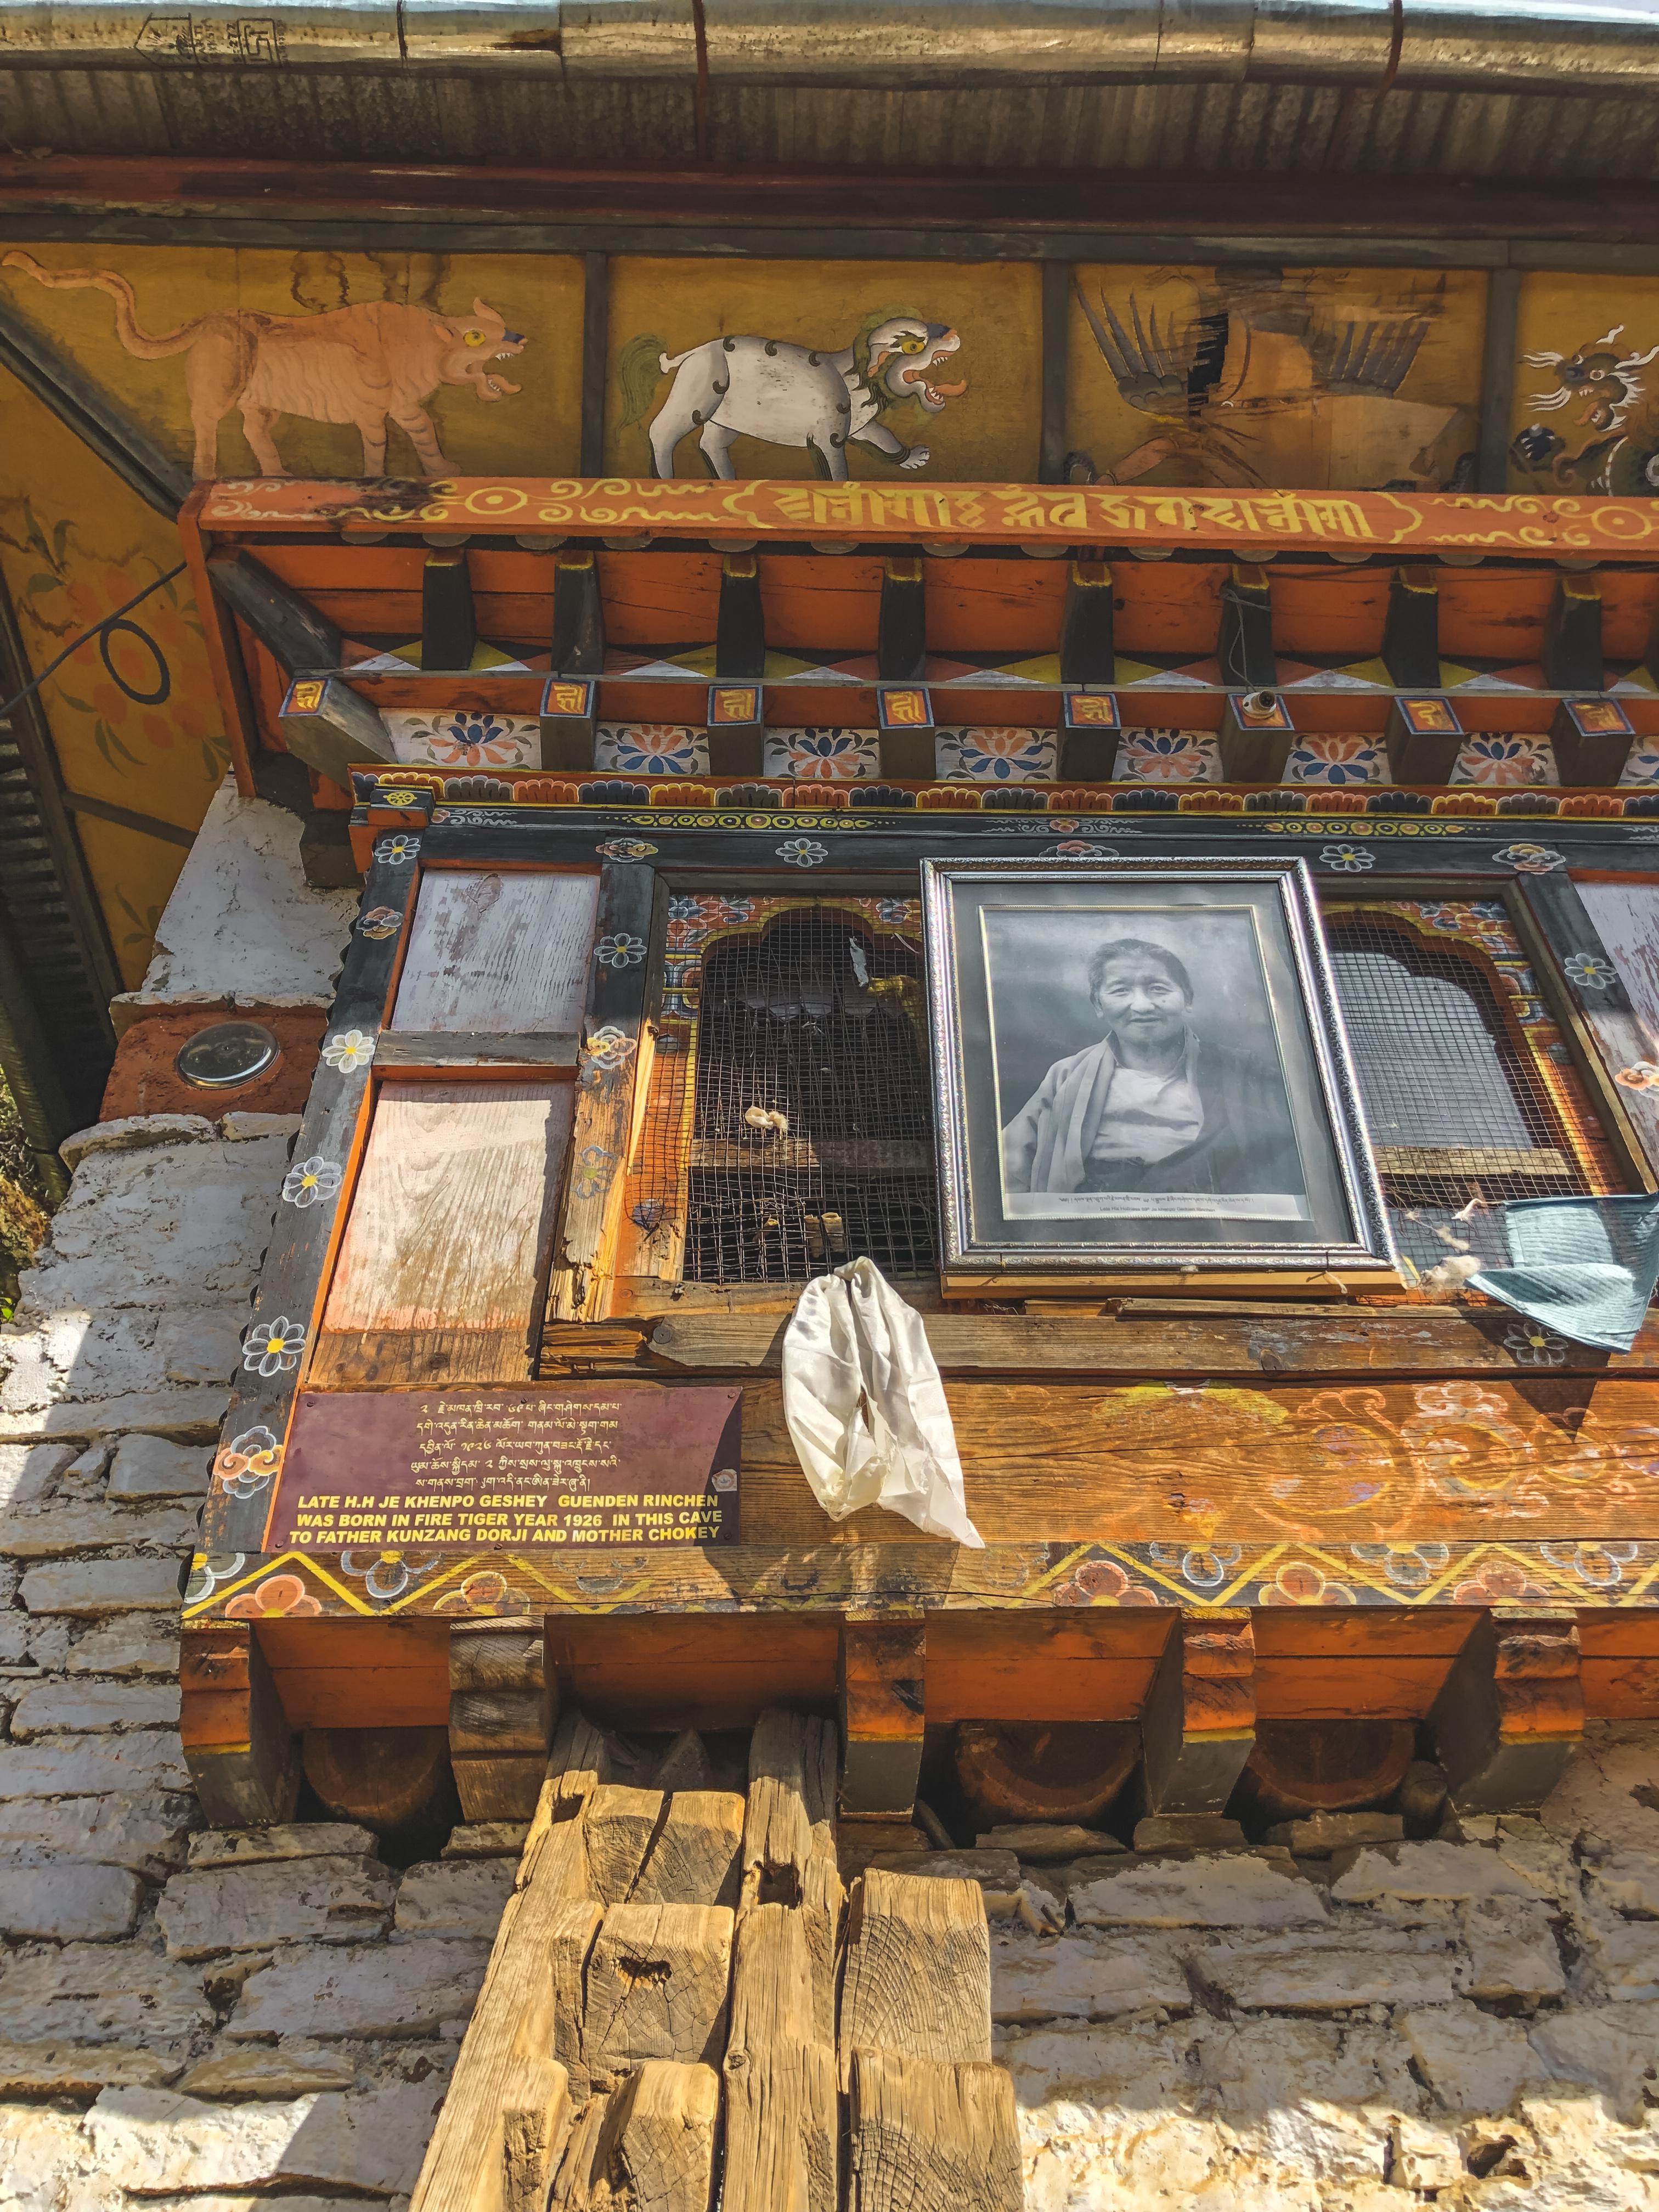 Things to do in Bhutan